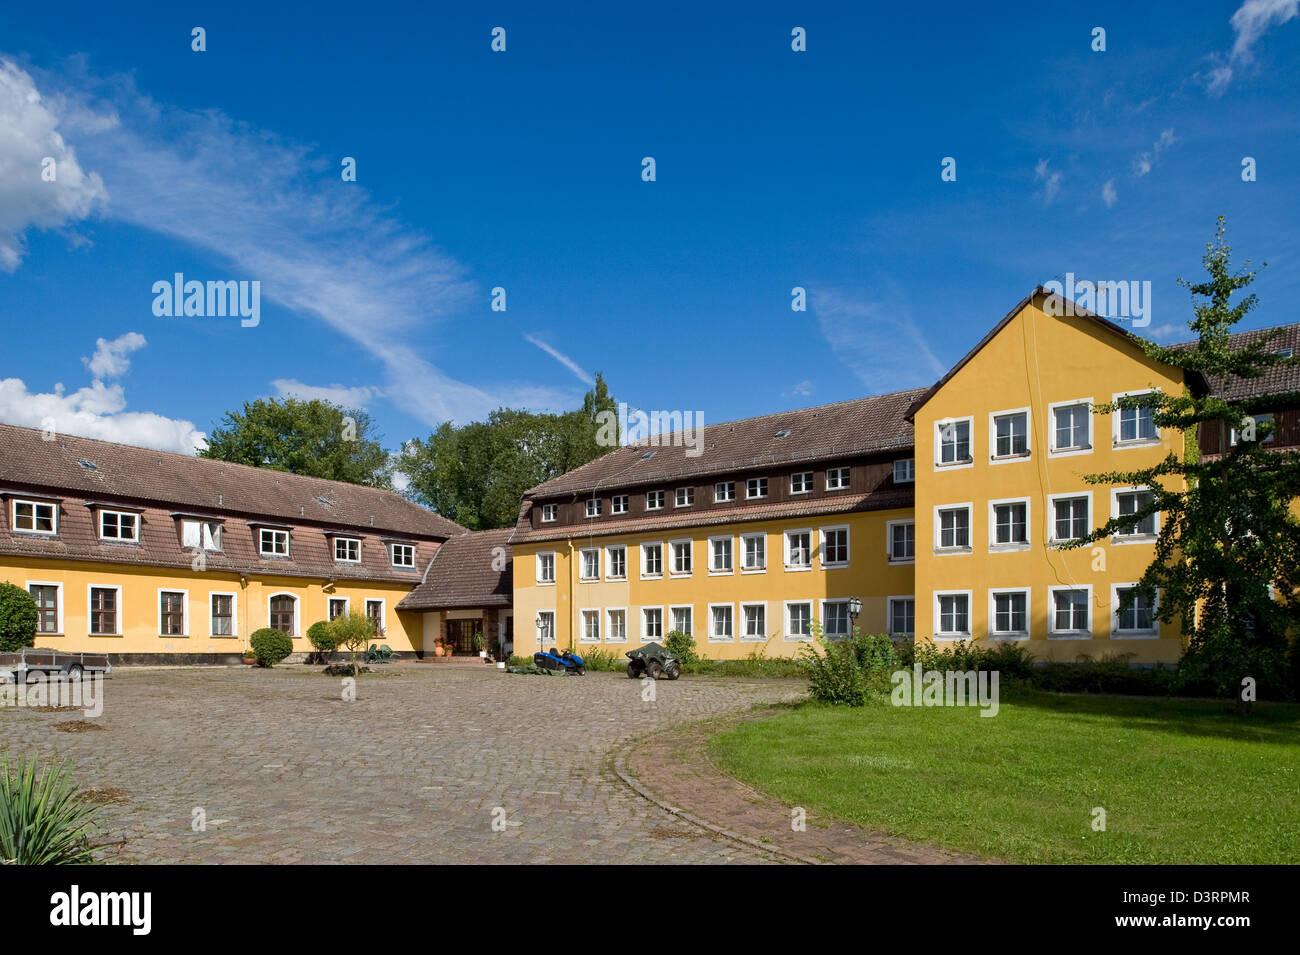 Teupitz, Germany, Castle Teupitz, currently unused - Stock Image